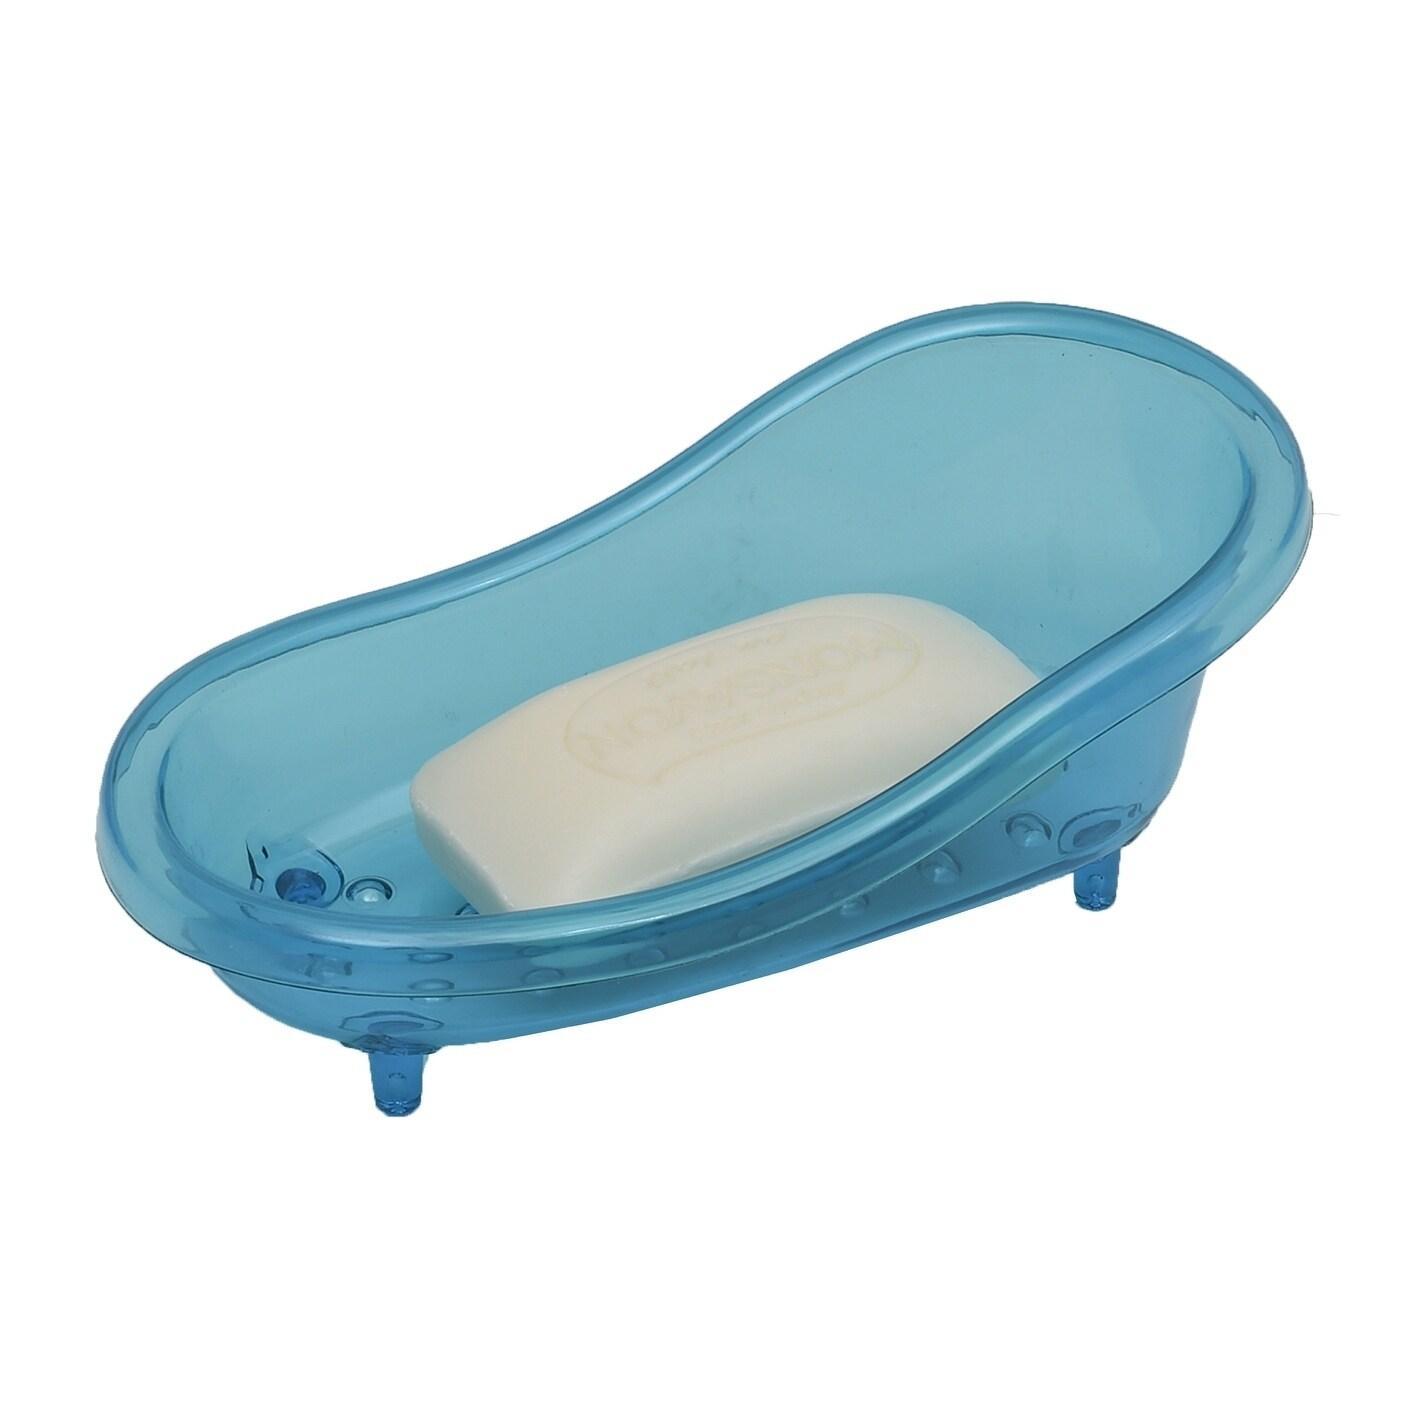 Shop Evideco Claw-foot Deco Bathtub Soap Dish EVE Clear Acrylic ...